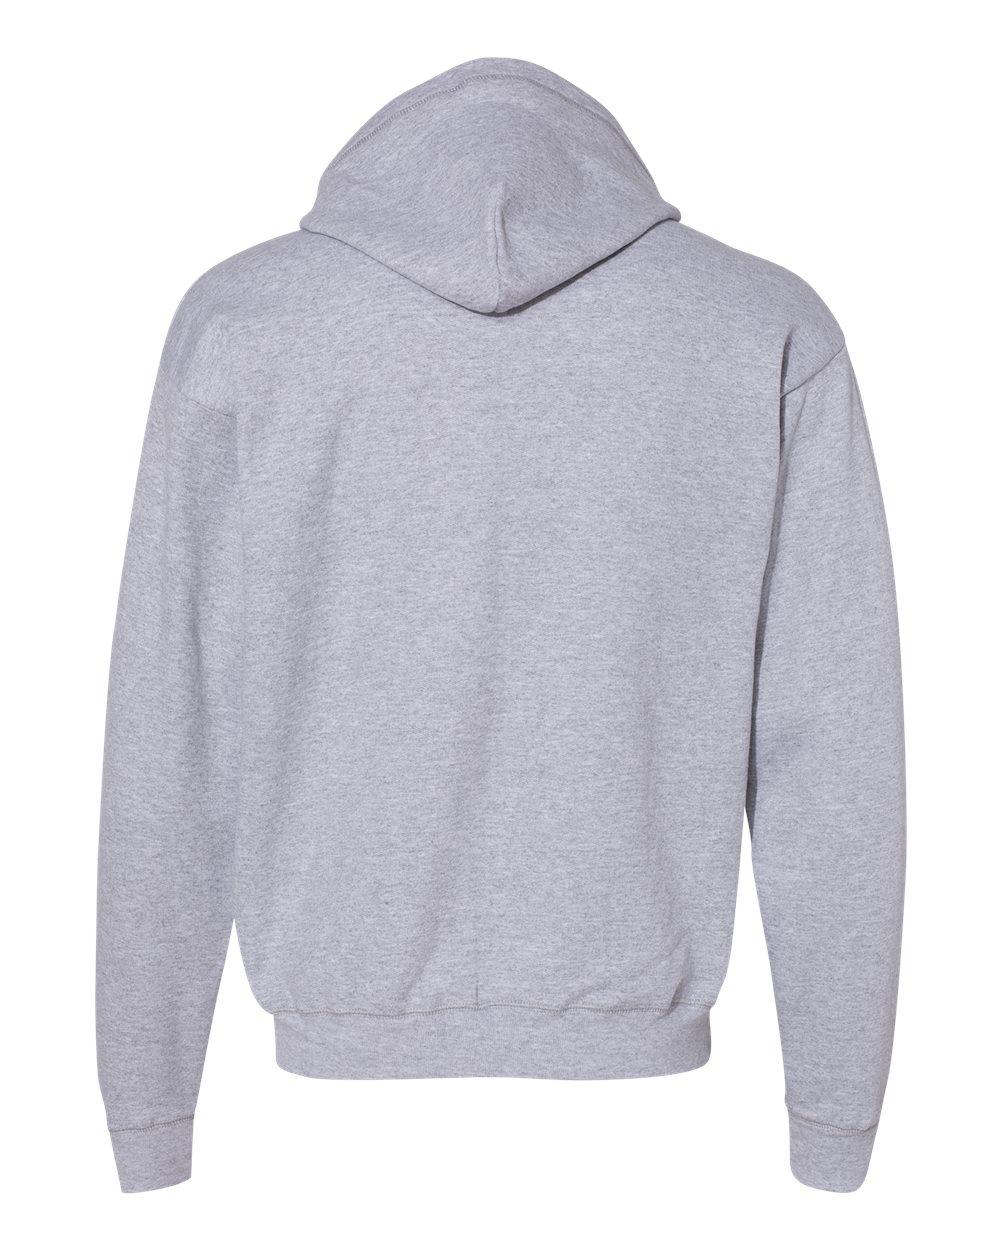 Hanes-Mens-Ecosmart-Blend-Full-Zip-Hooded-Sweatshirt-P180-up-to-3XL miniature 10